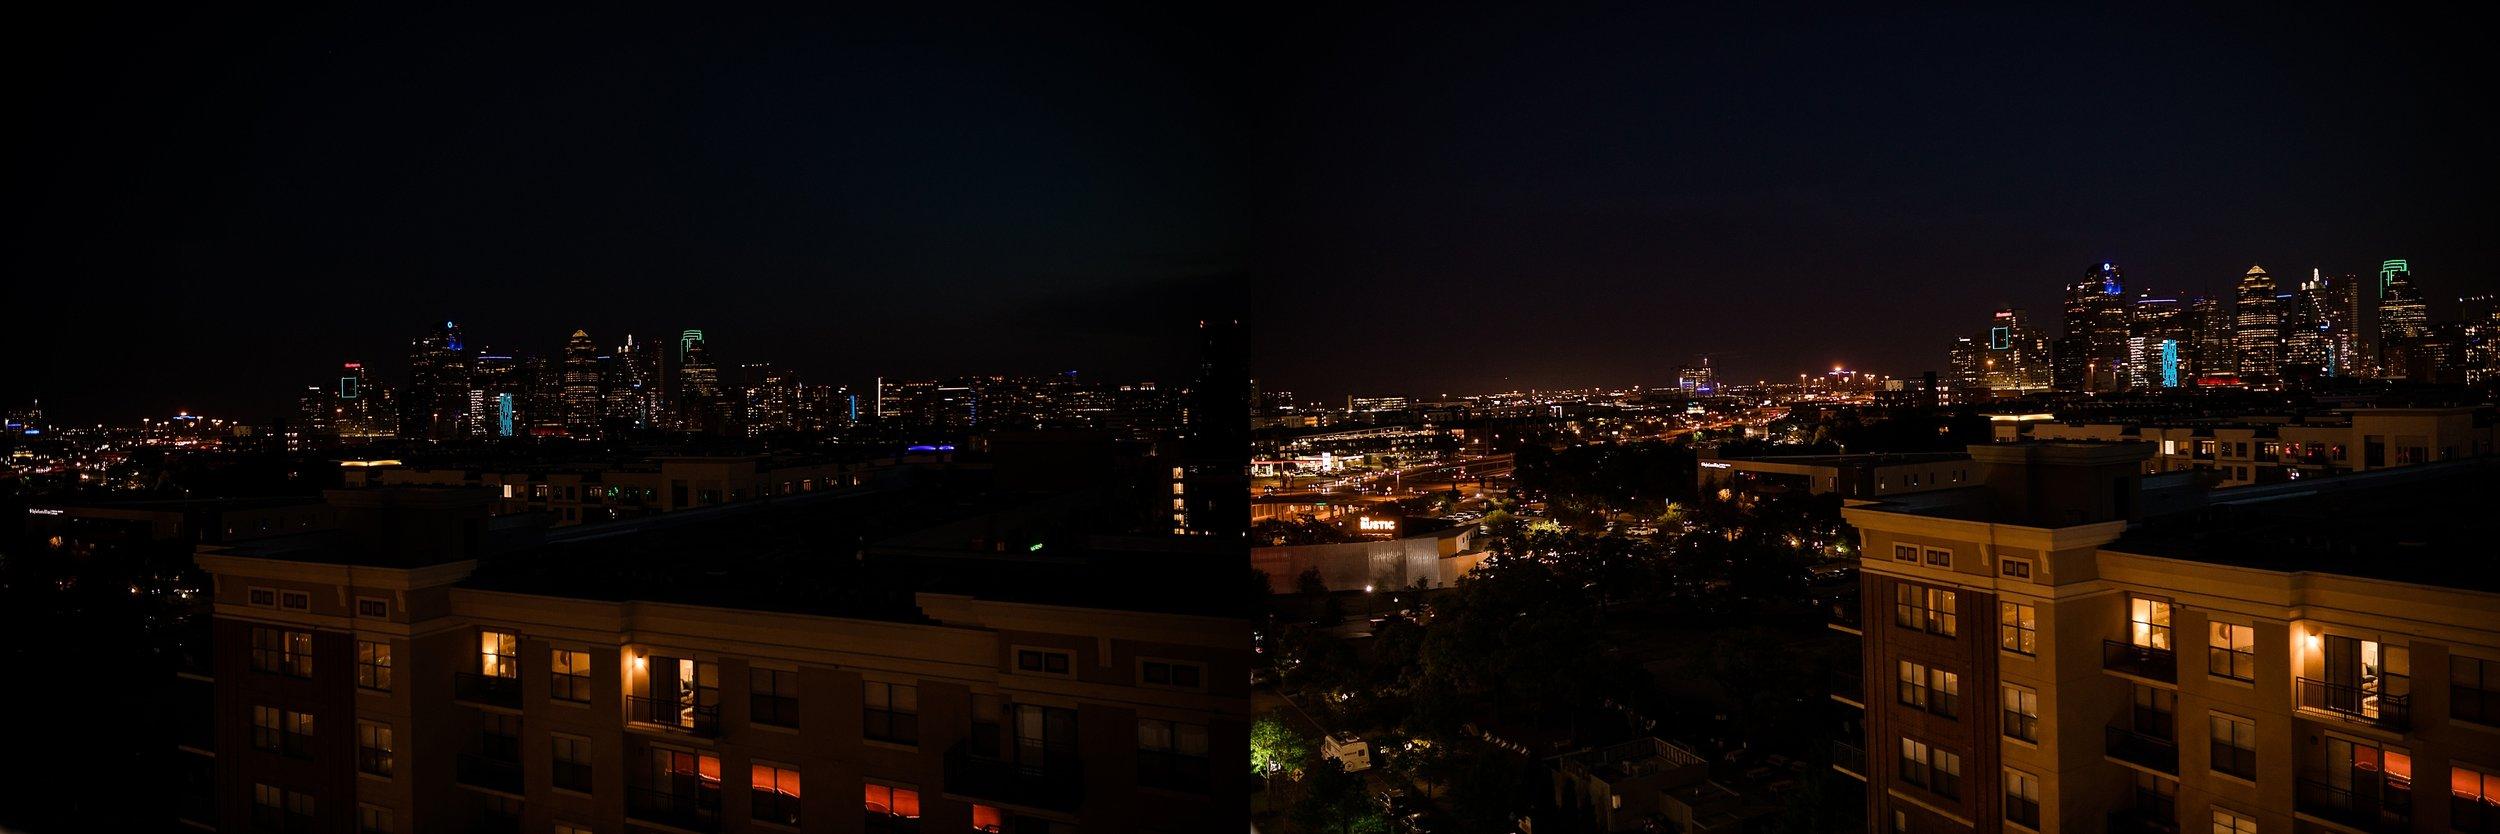 That skyline at night!!